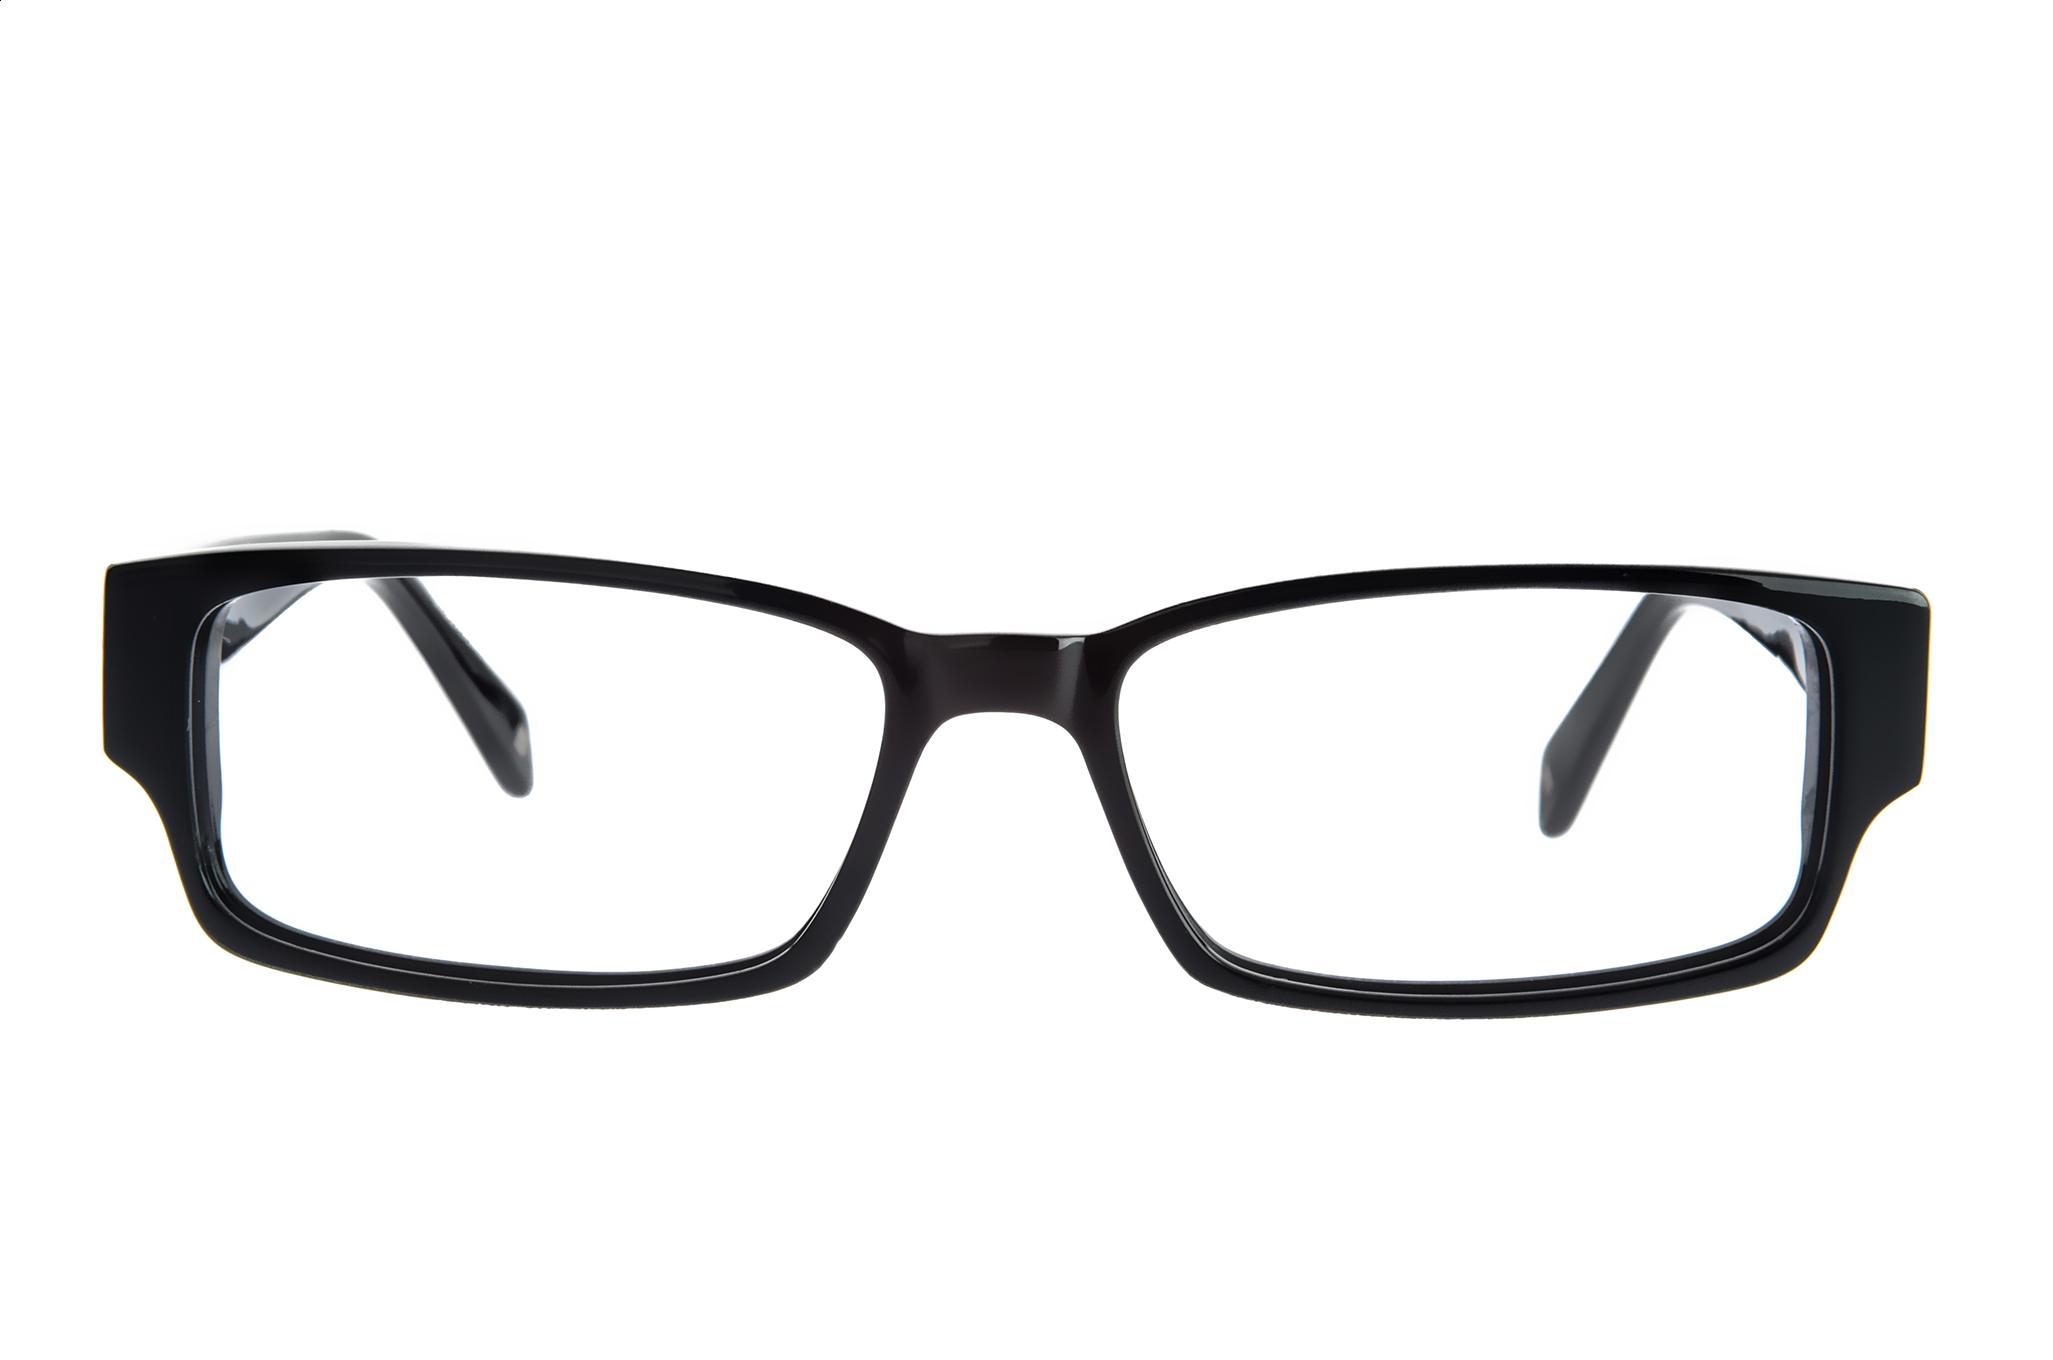 d46eb39e20 Glasses PNG images